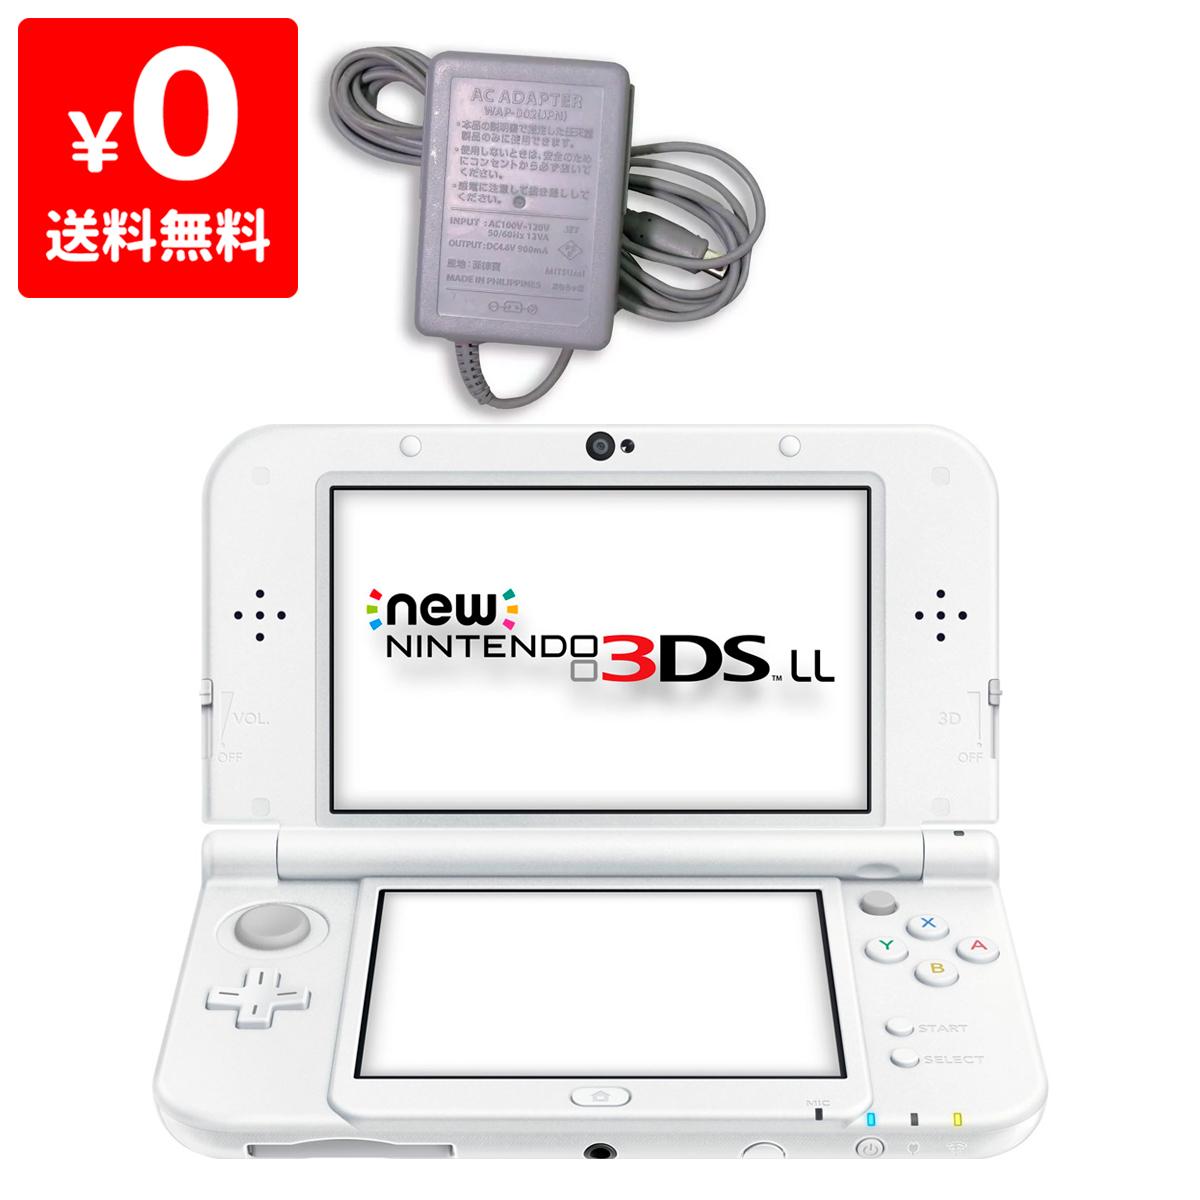 New3DSLL Newニンテンドー3DS LL パールホワイト 本体 すぐ遊べるセット Nintendo 任天堂 ニンテンドー 中古 4902370529128 送料無料 【中古】